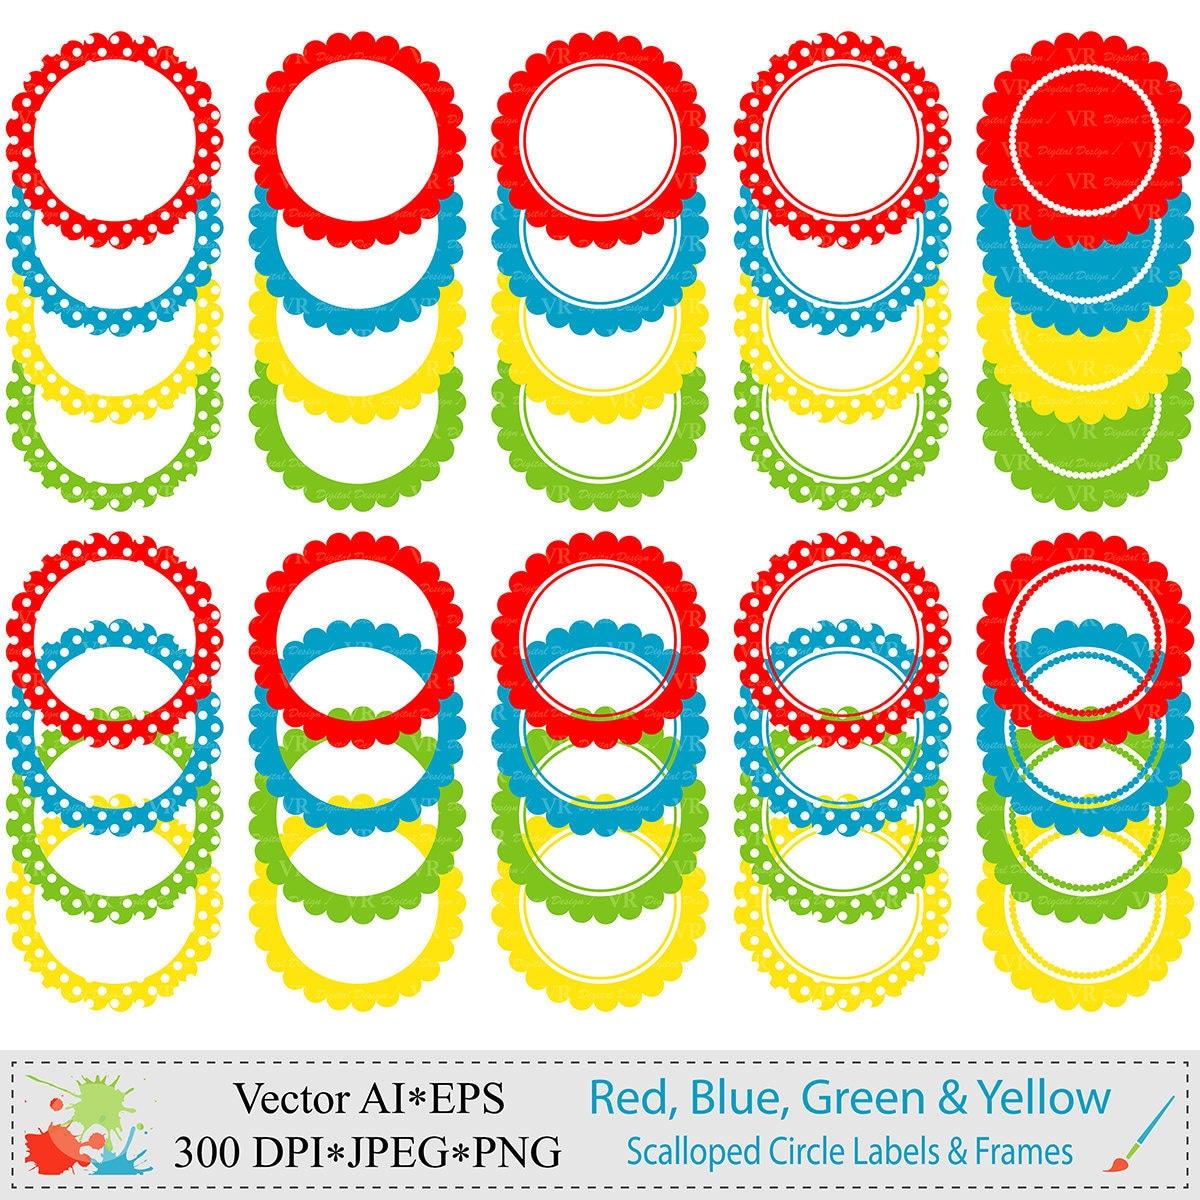 Scalloped Kreis Etiketten und Rahmen ClipArt digitale